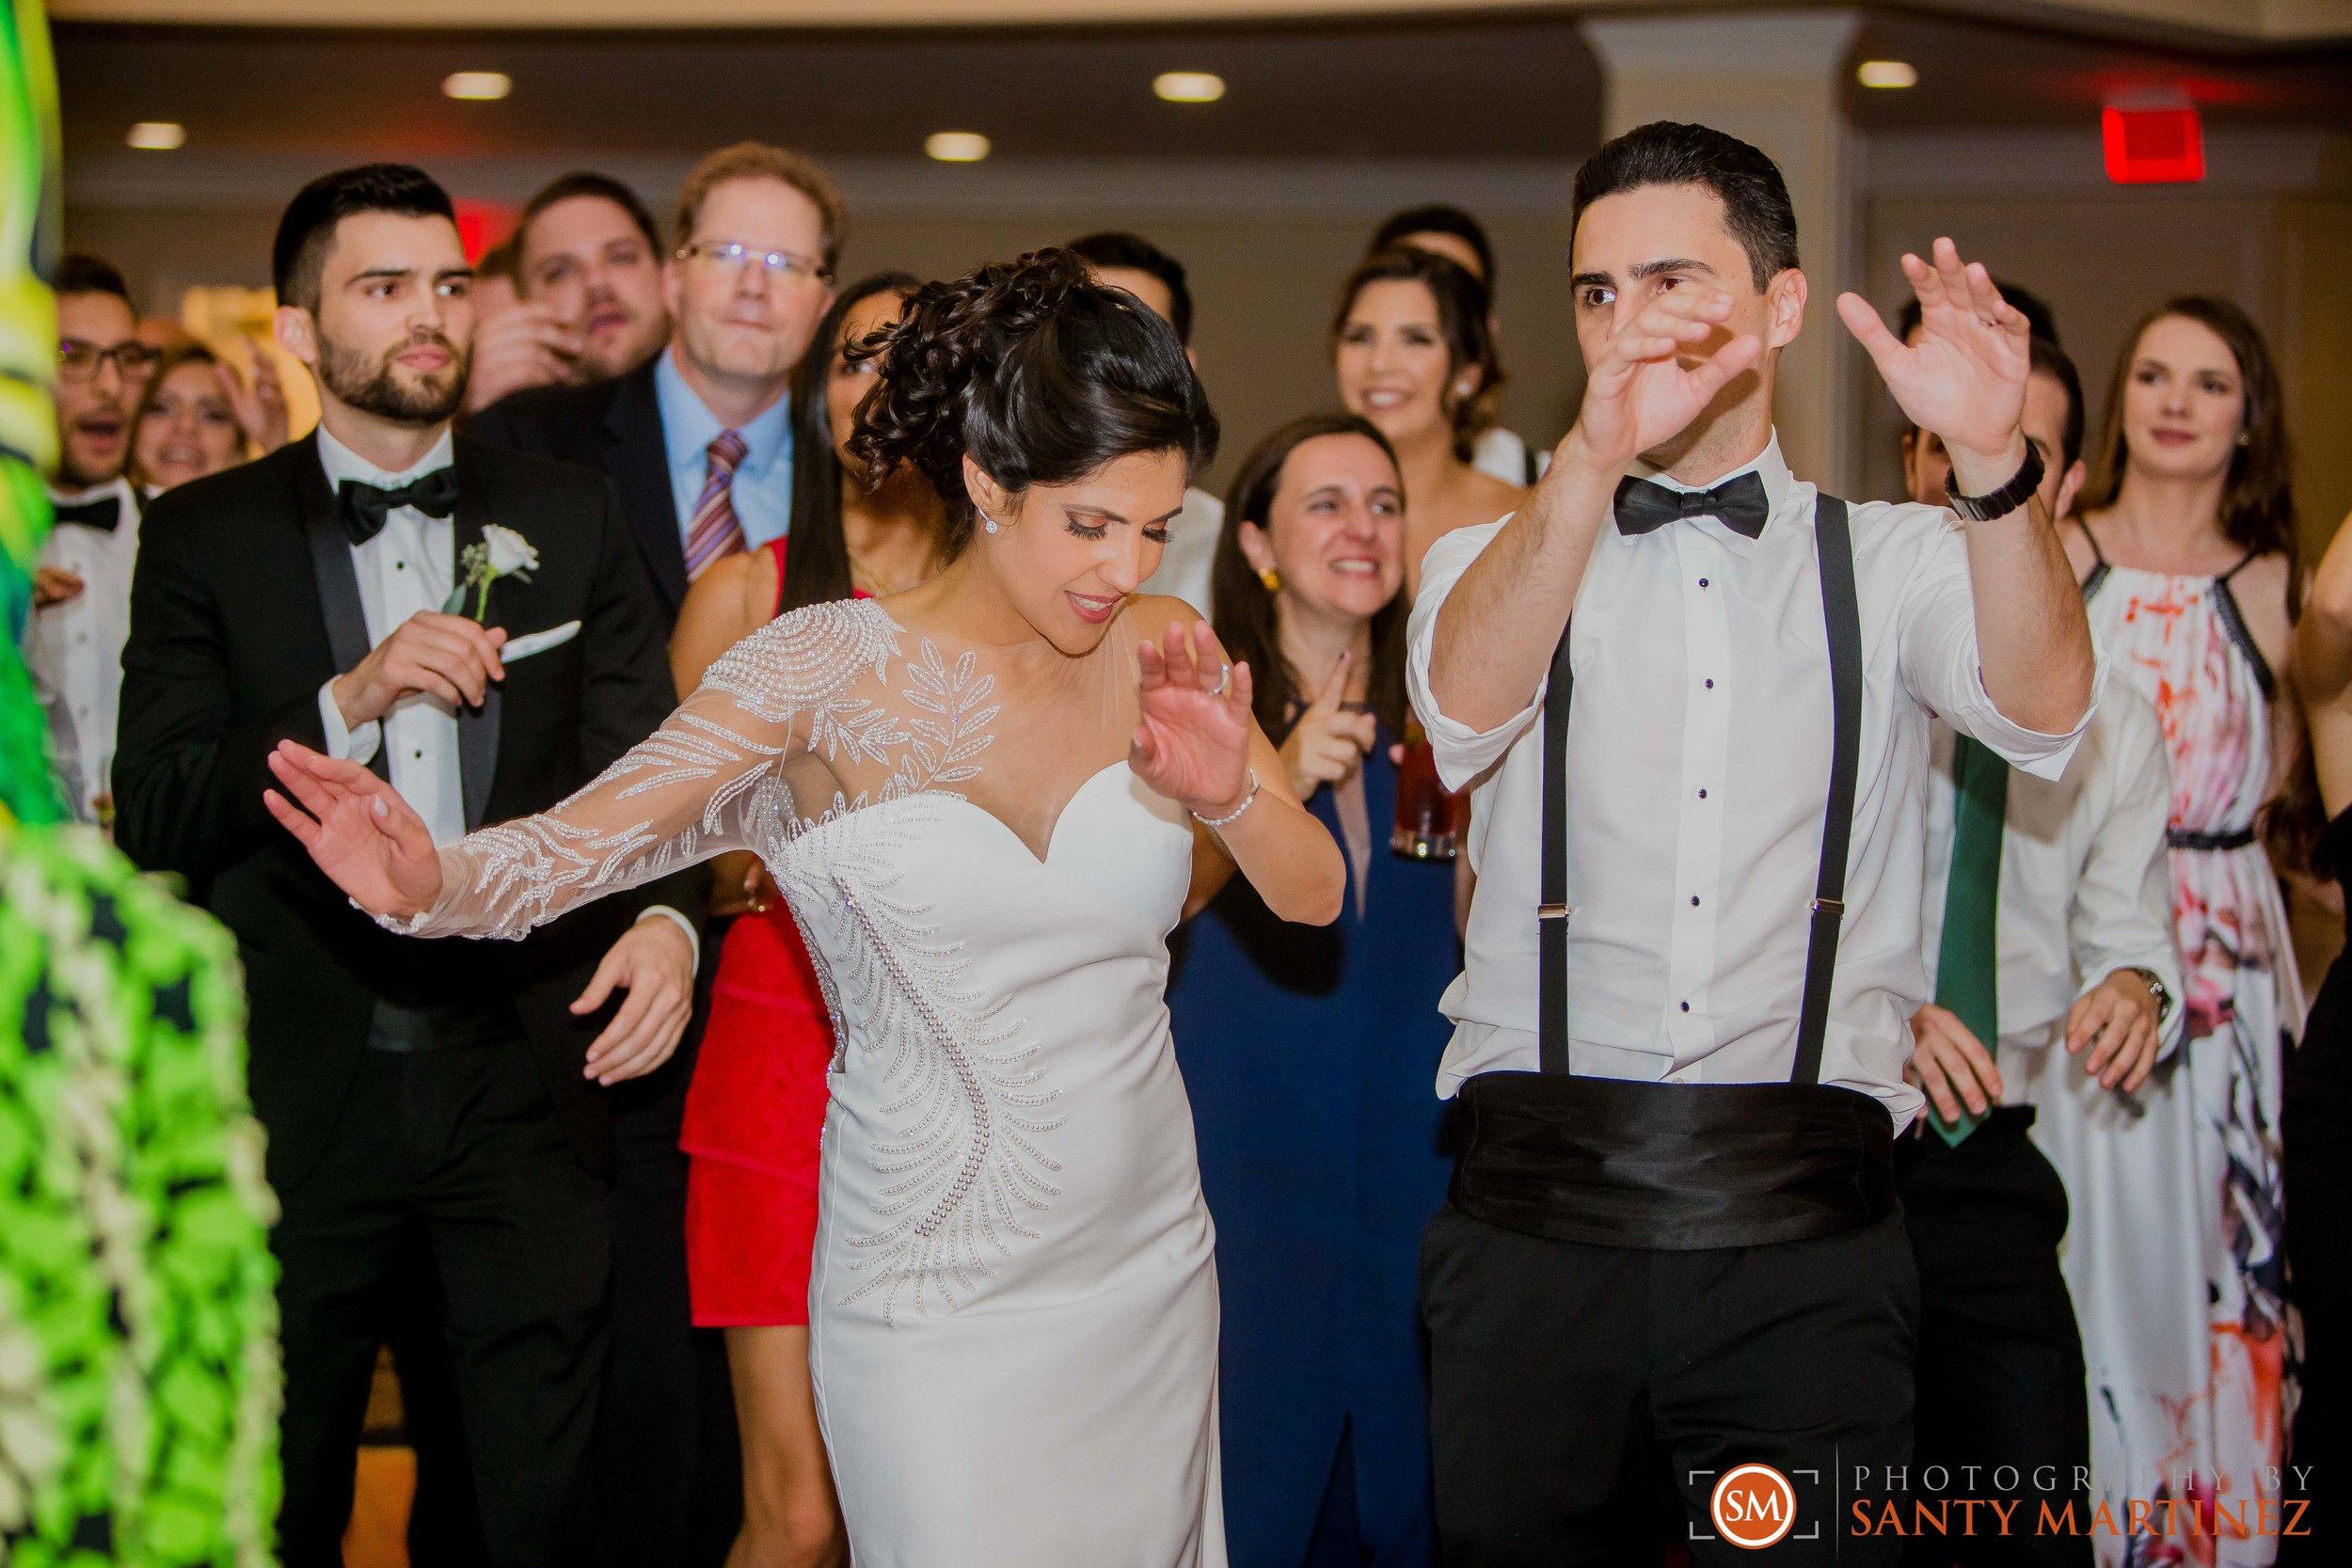 Wedding Trump National Doral Miami - Photography by Santy Martinez-42.jpg